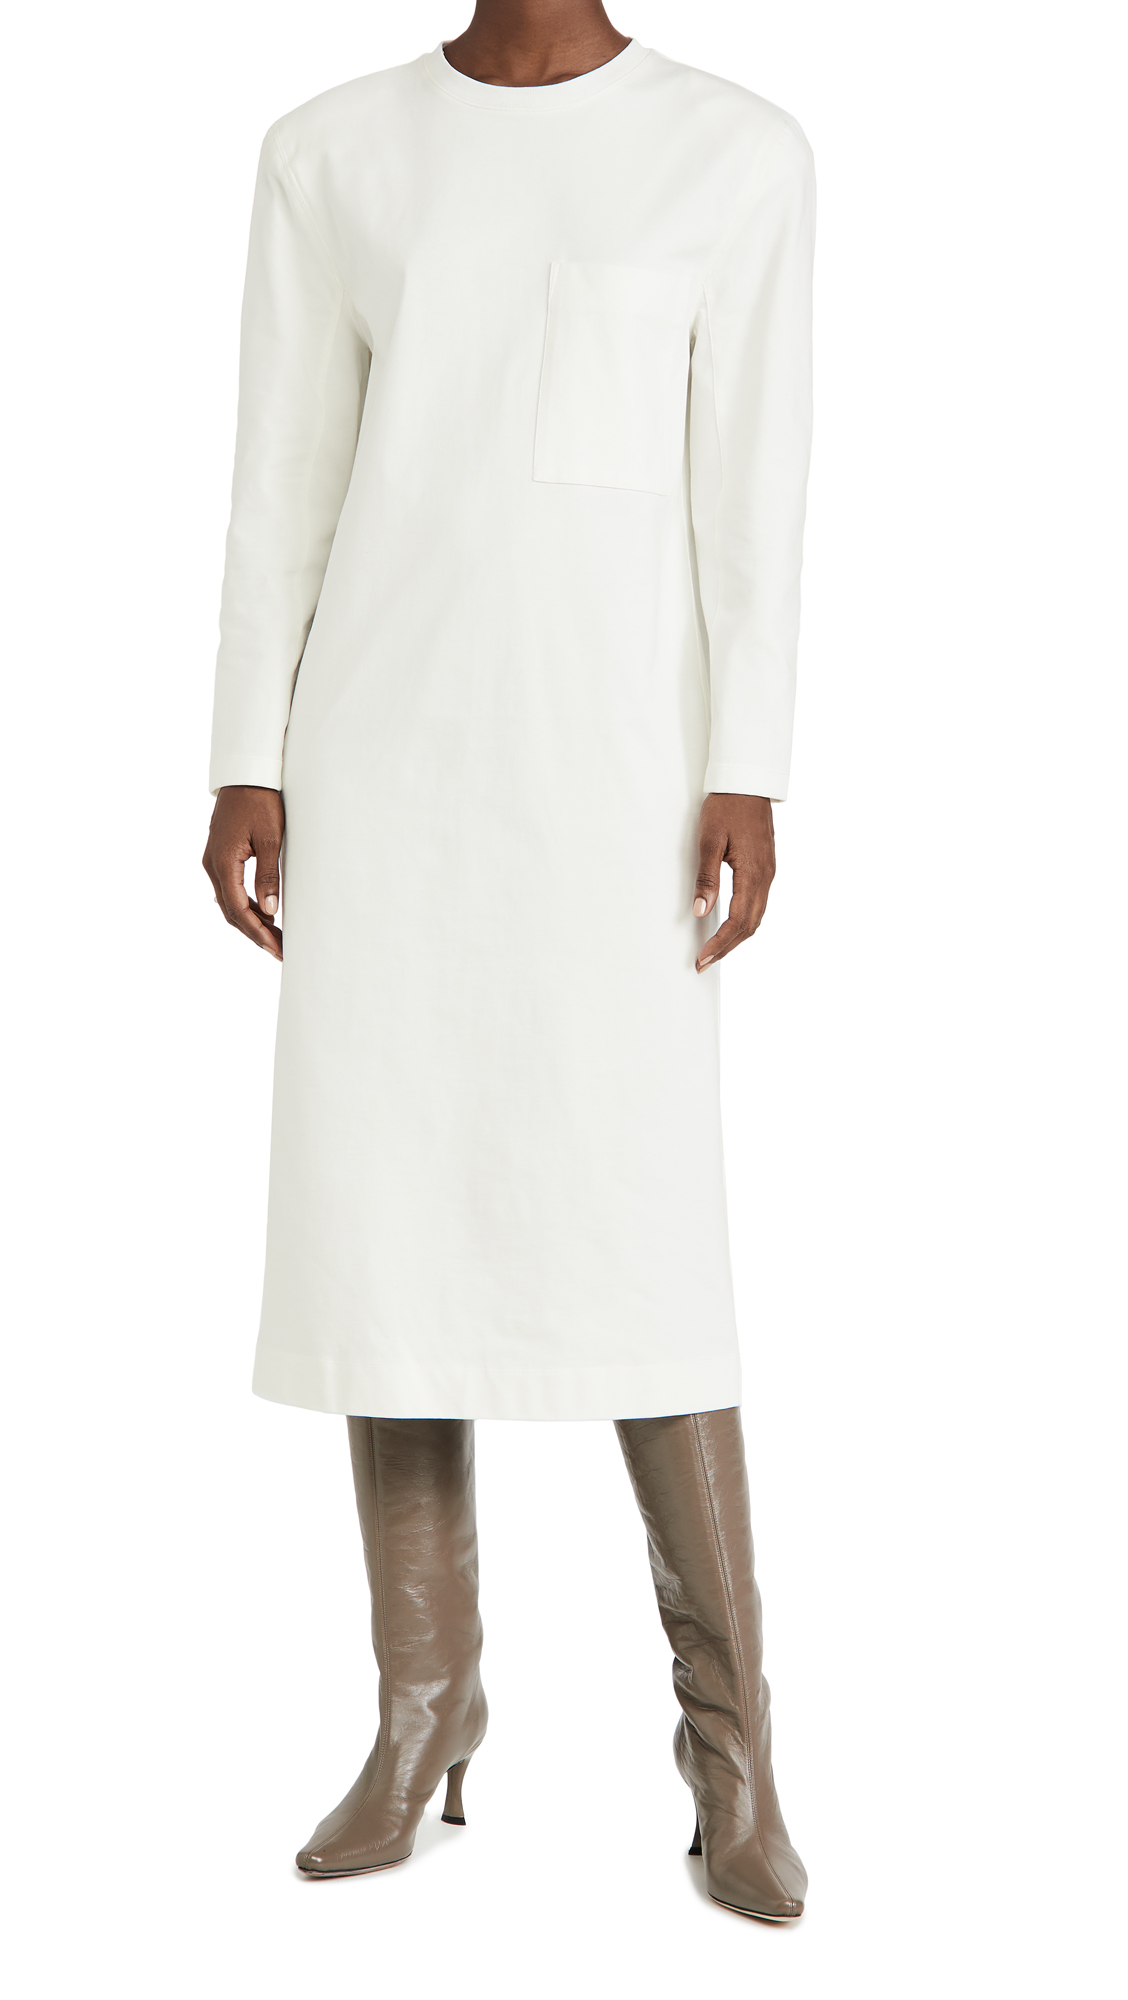 Tibi Long Sleeve Shoulder Pad Dress